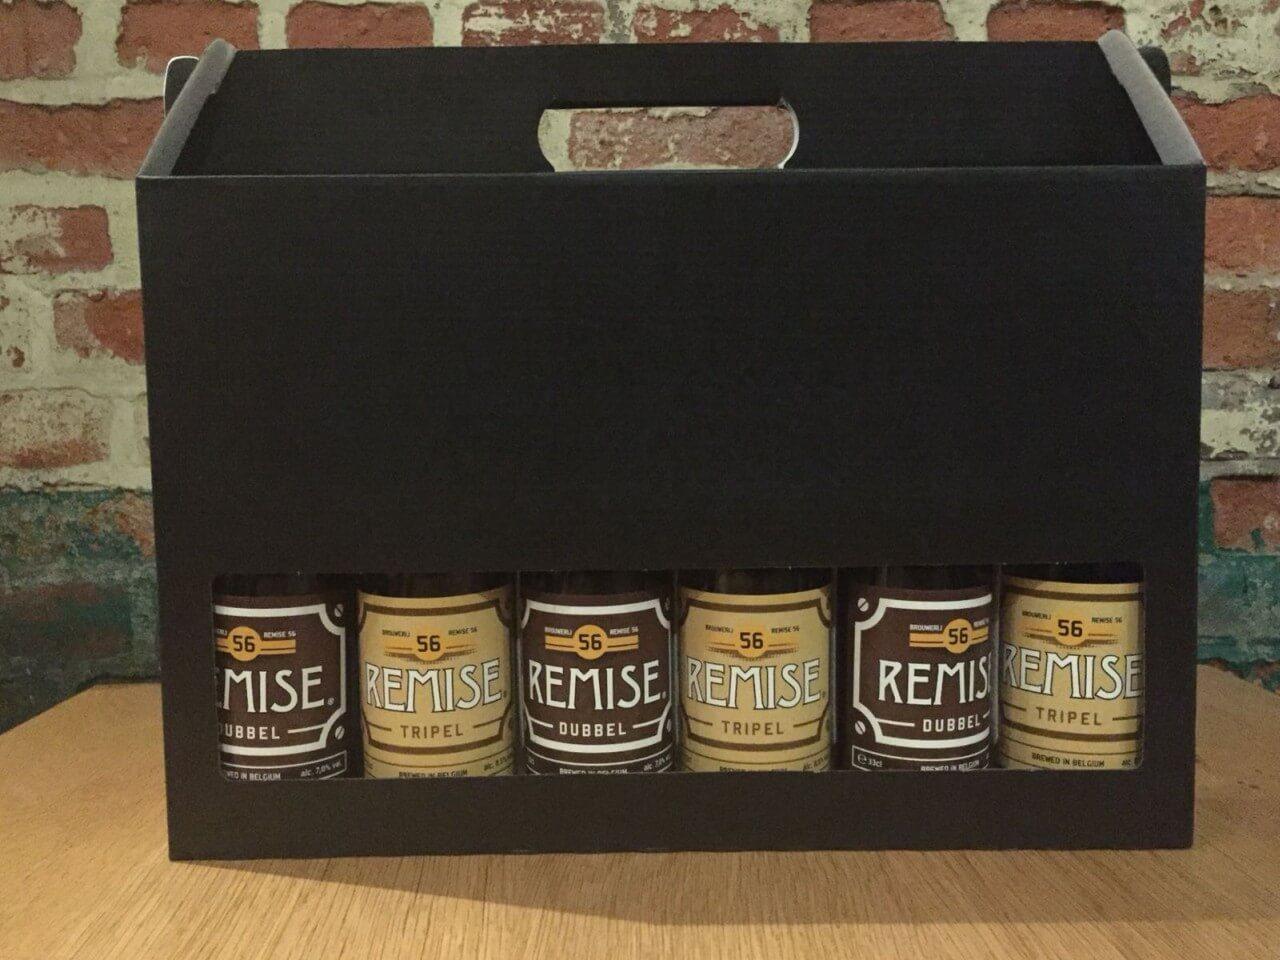 Geschenk koffer met Remise 56 Dubbel en Tripel